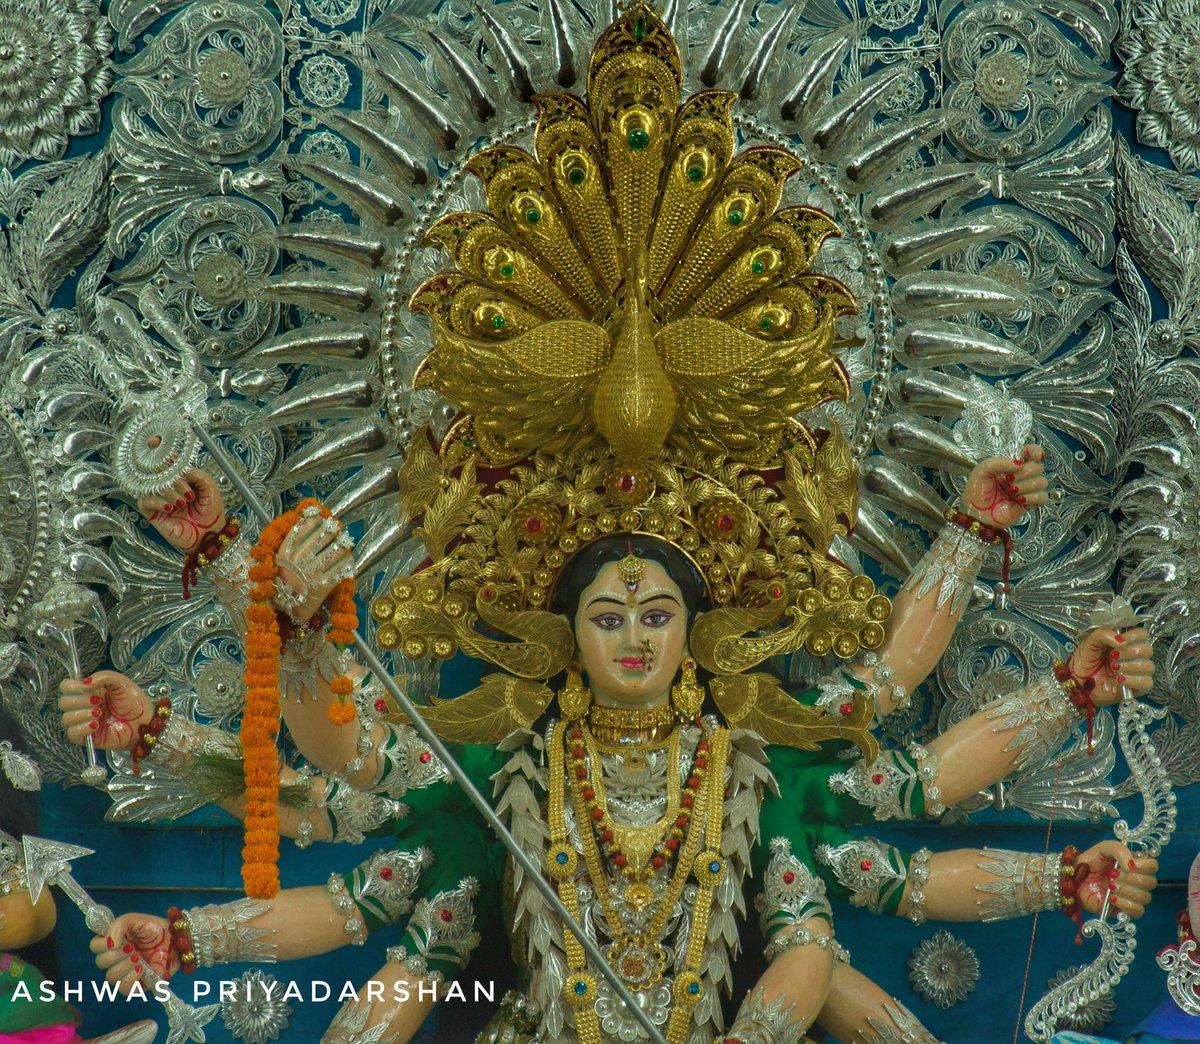 Chauliaganj Durga Puja Cuttack Ashwas 2017 3 Bhubaneswar